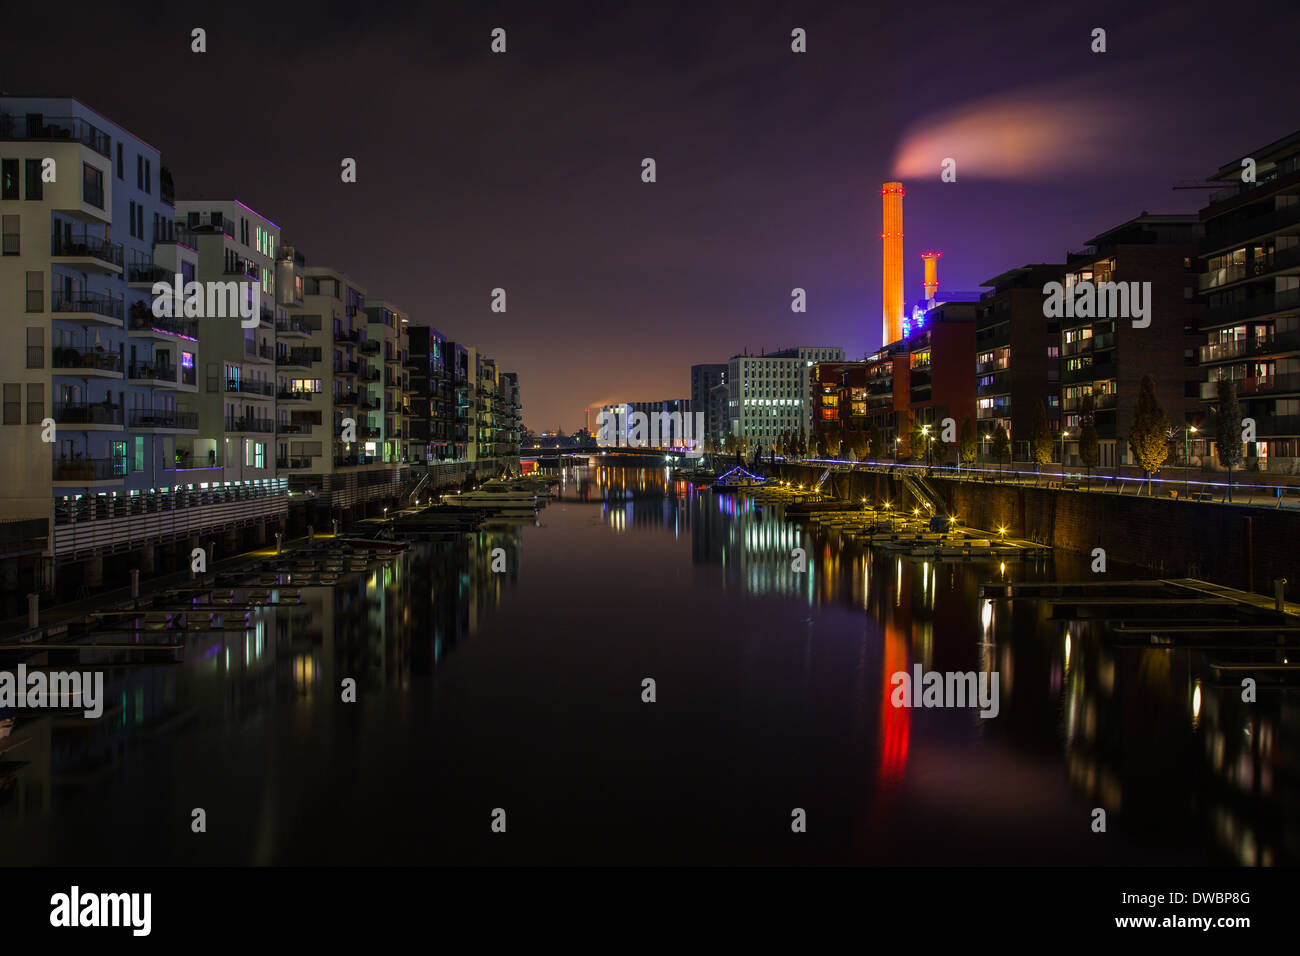 Germany, Hesse, Frankfurt, Residential buildings at Westhafen at night Stock Photo